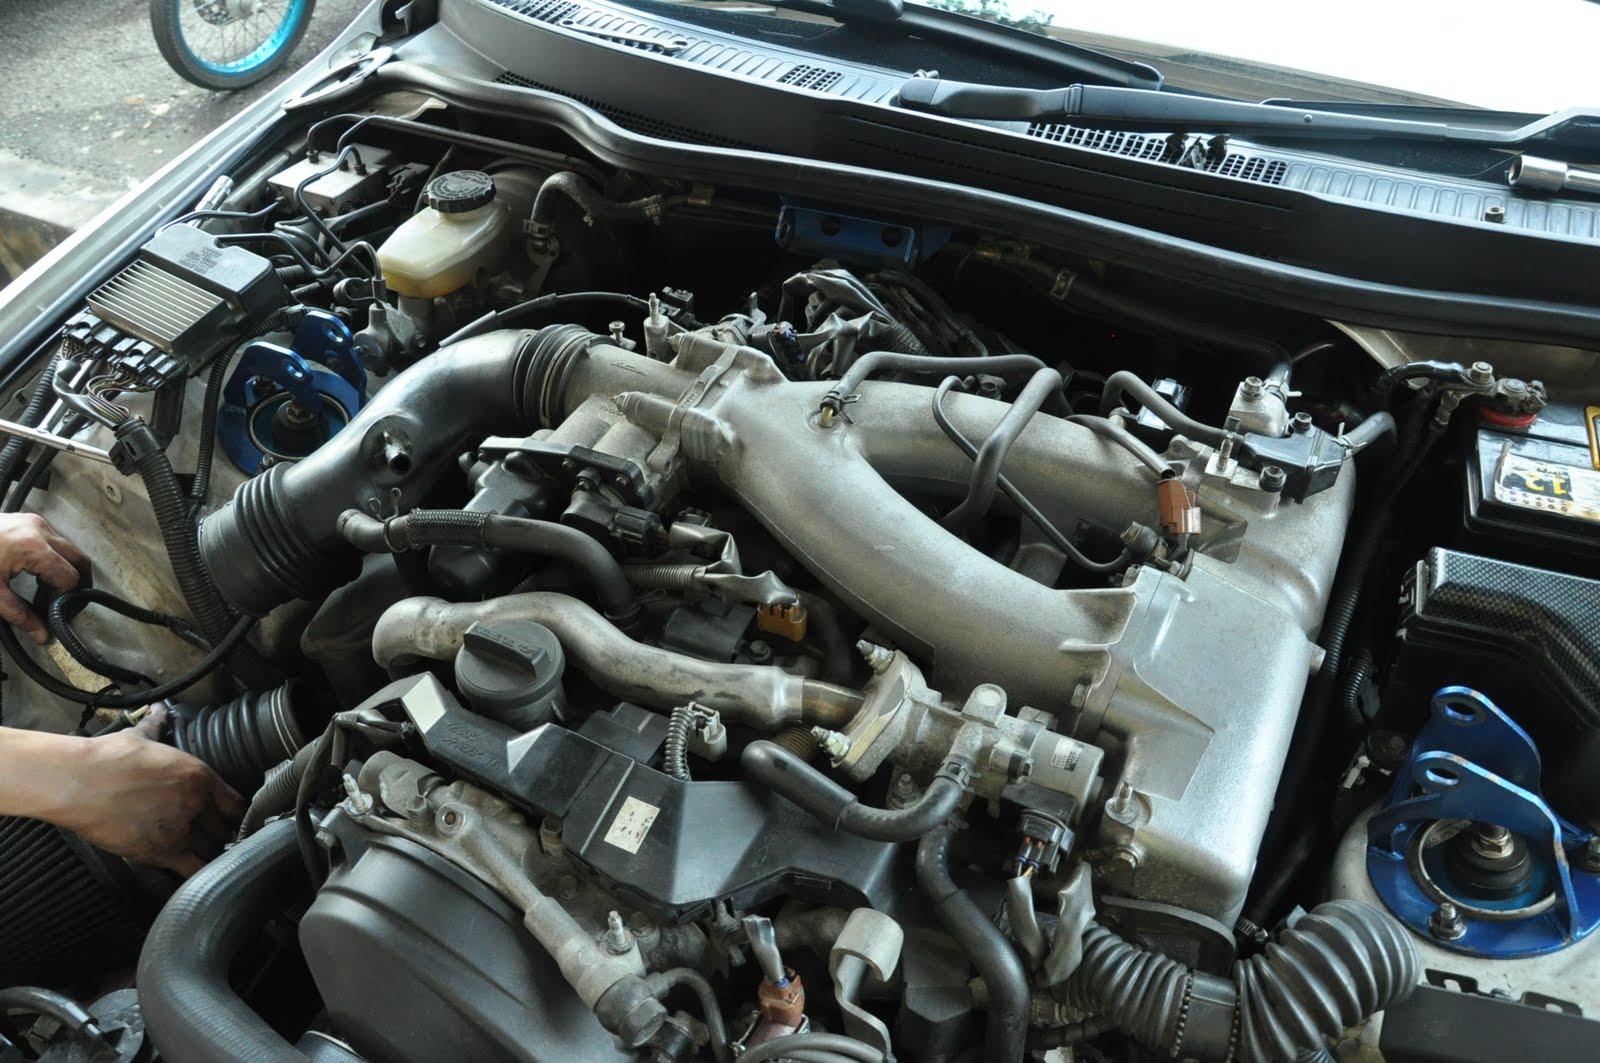 1jz Fse Wiring Diagram 2005 Pontiac Sunfire Stereo R N Autosport Vehicle And Engine Management